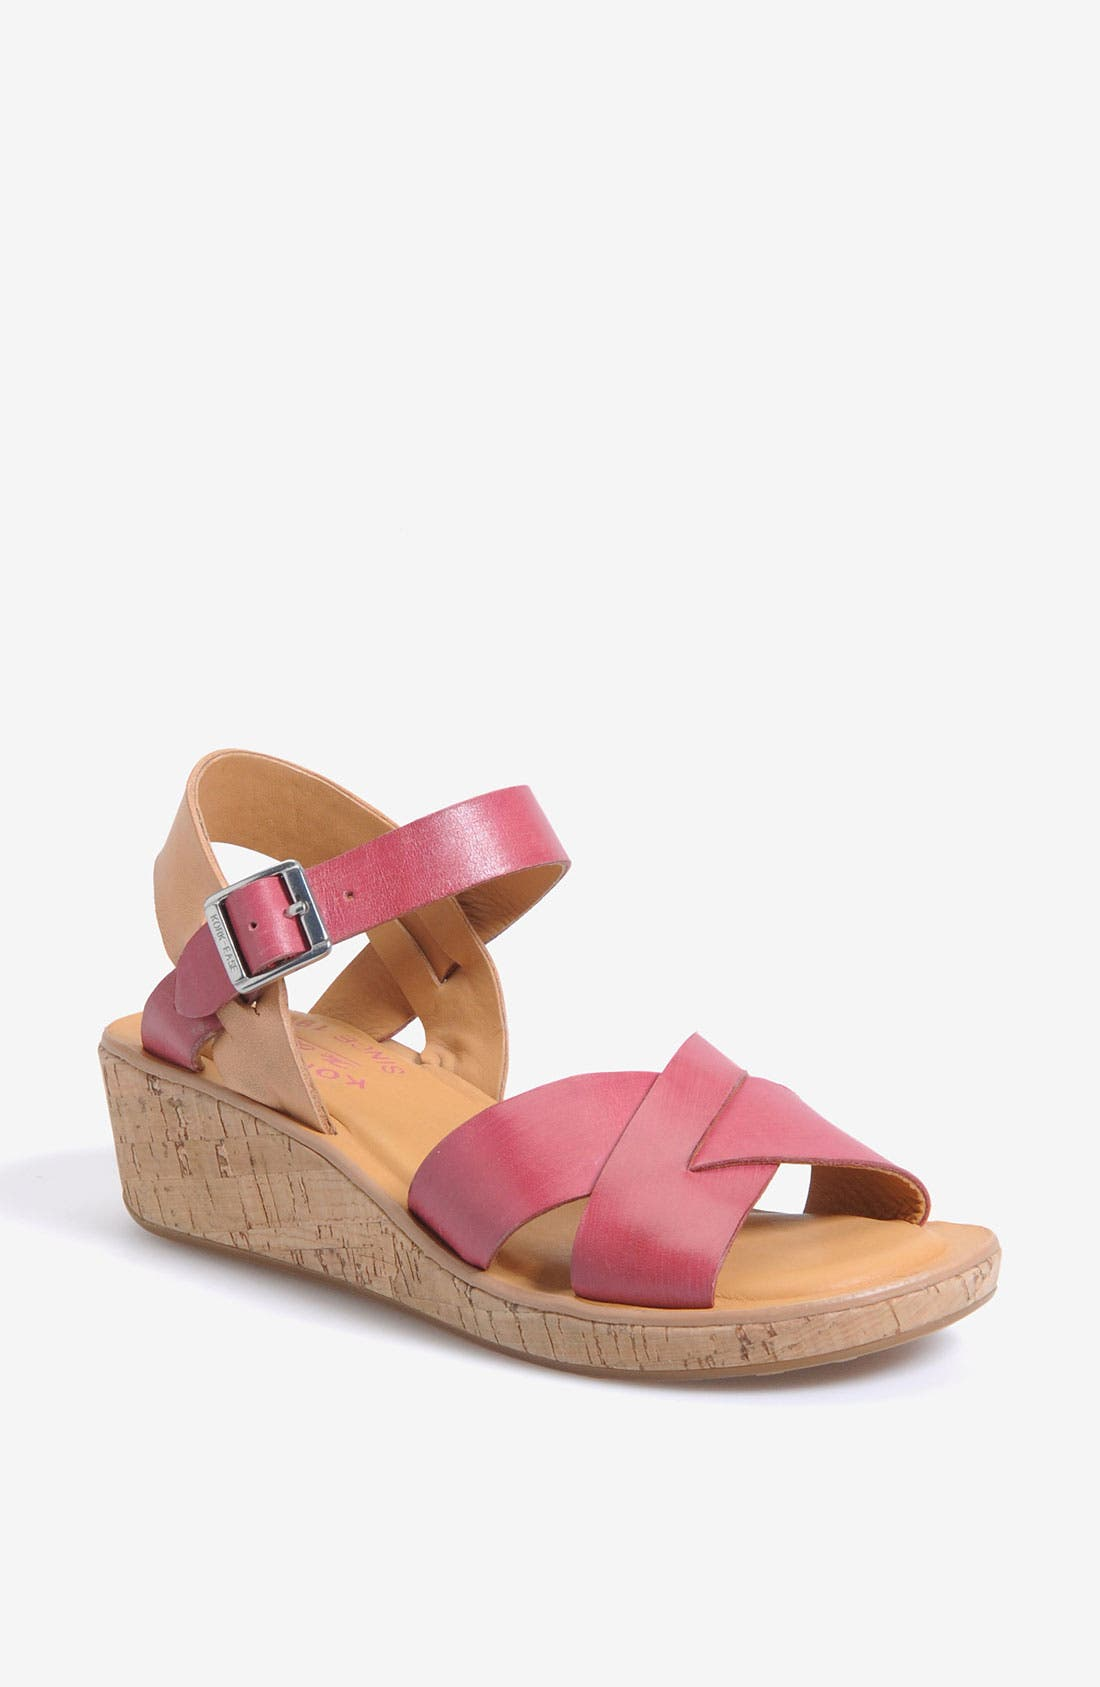 Main Image - Kork-Ease 'Myrna' Sandal